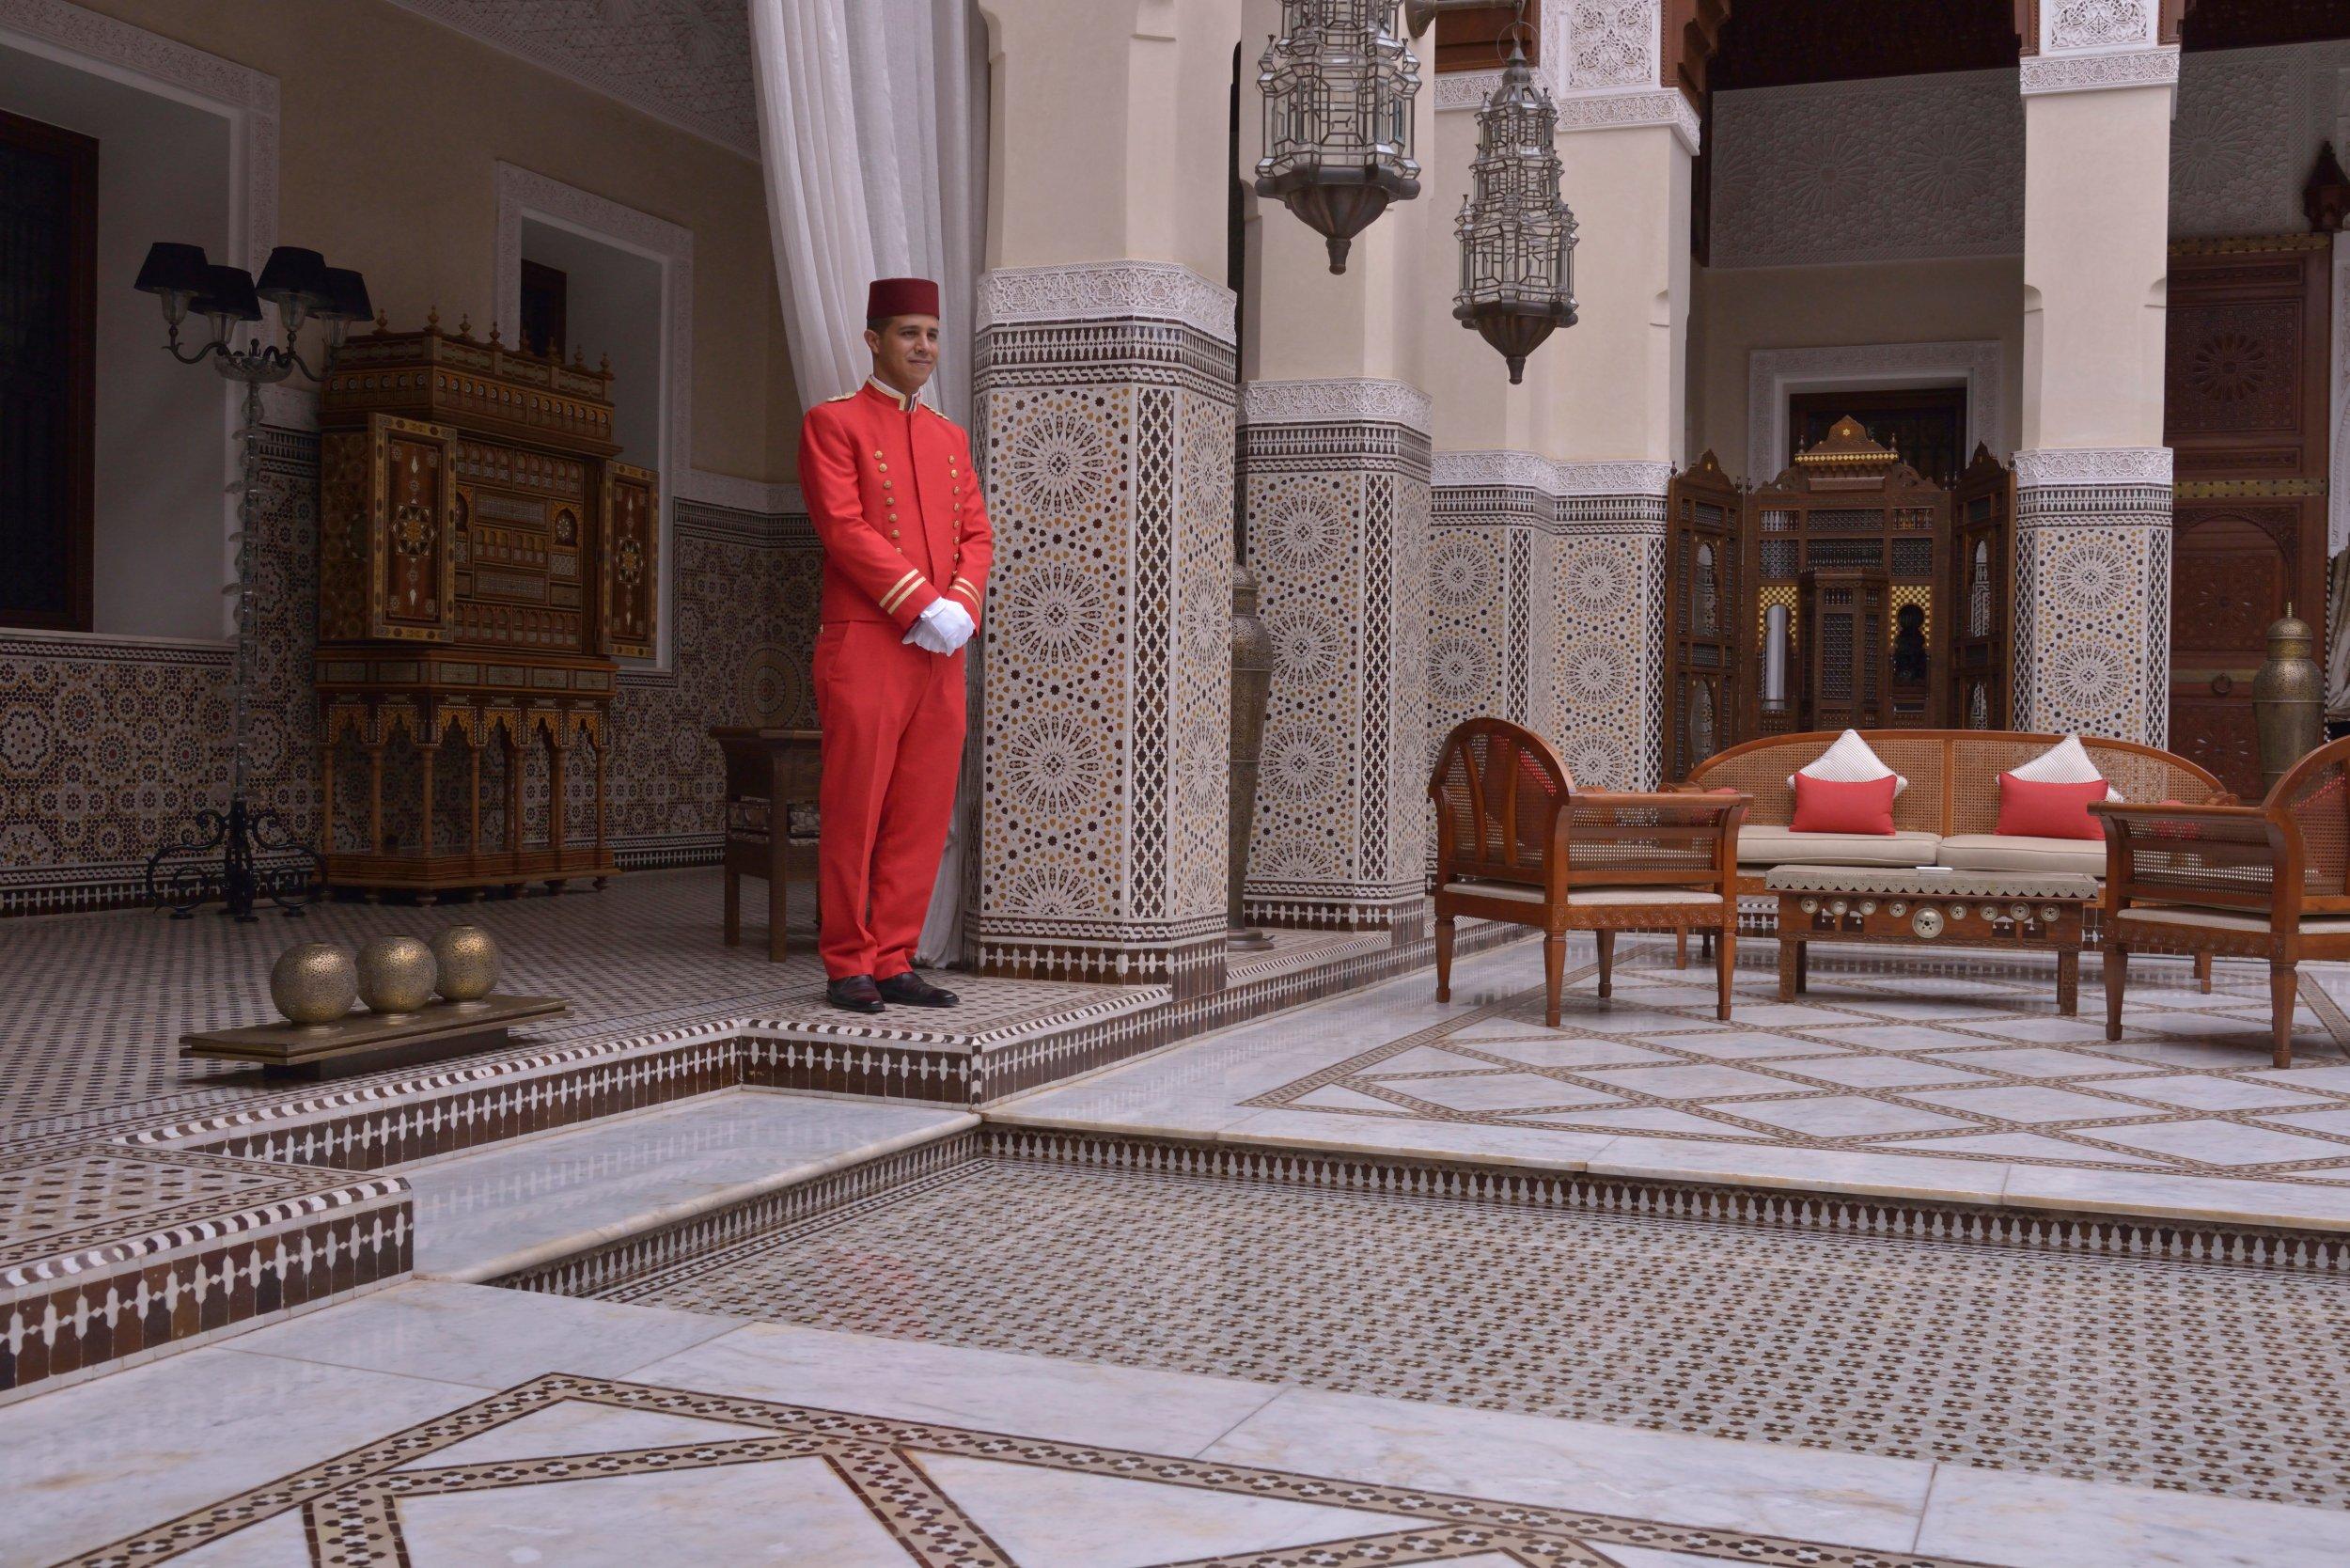 Marrakech, the 'Paris of the Sahara,' is Still a Magical Place